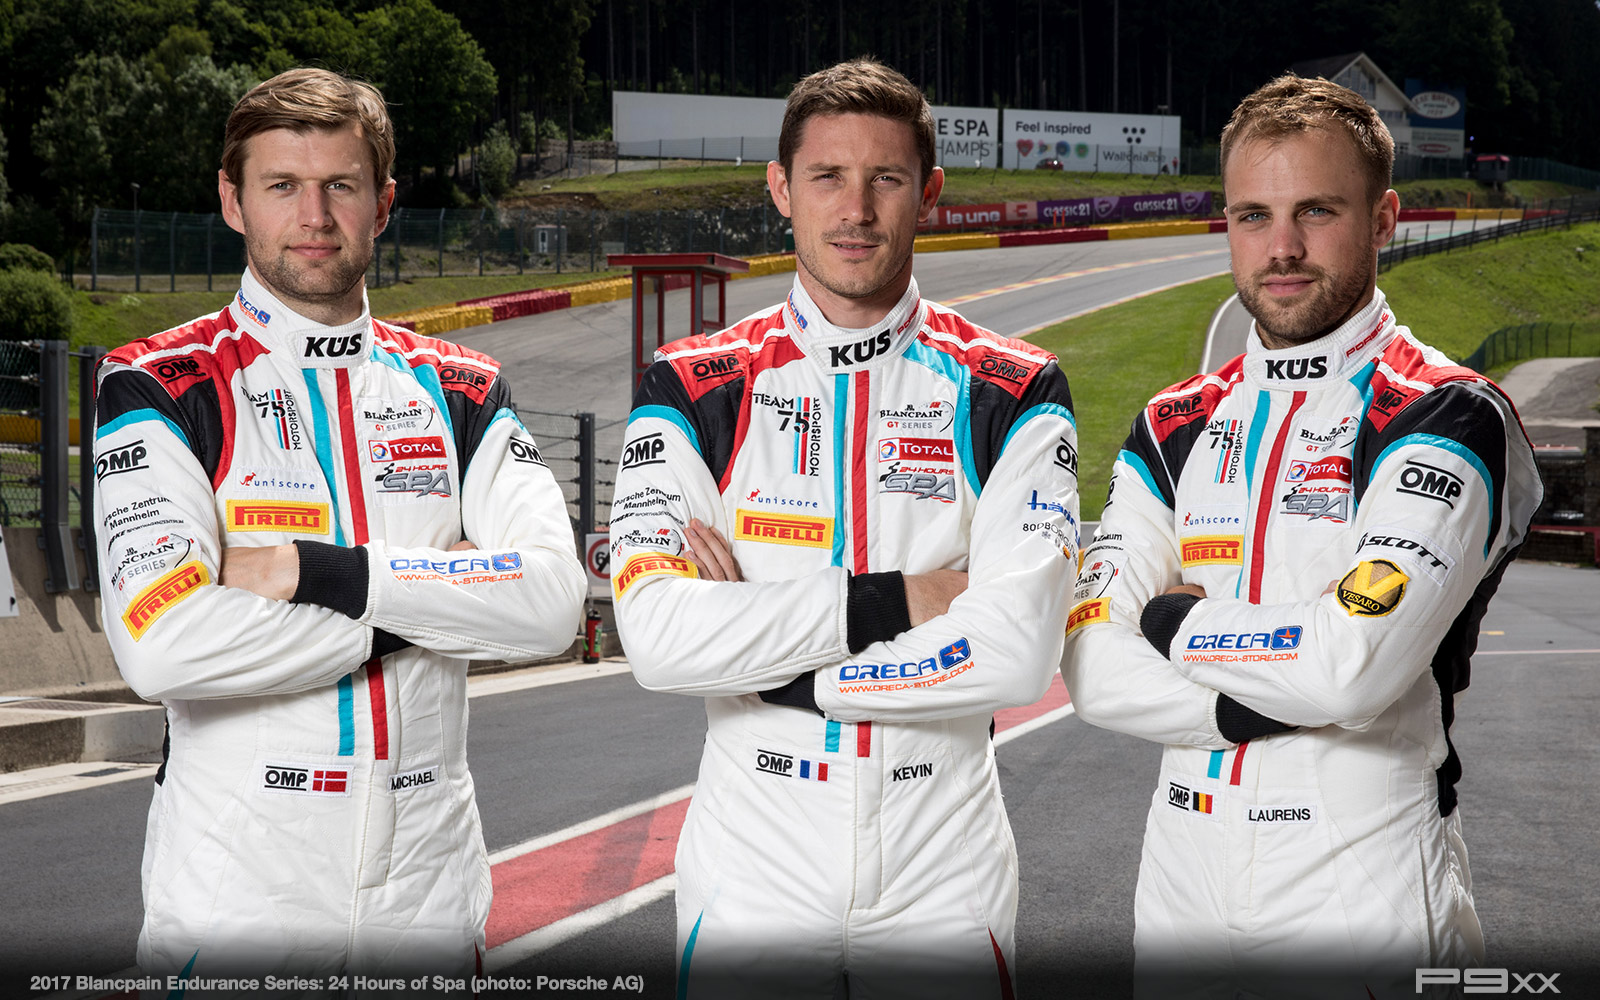 2017-24-Hours-of-Spa-Porsche-289